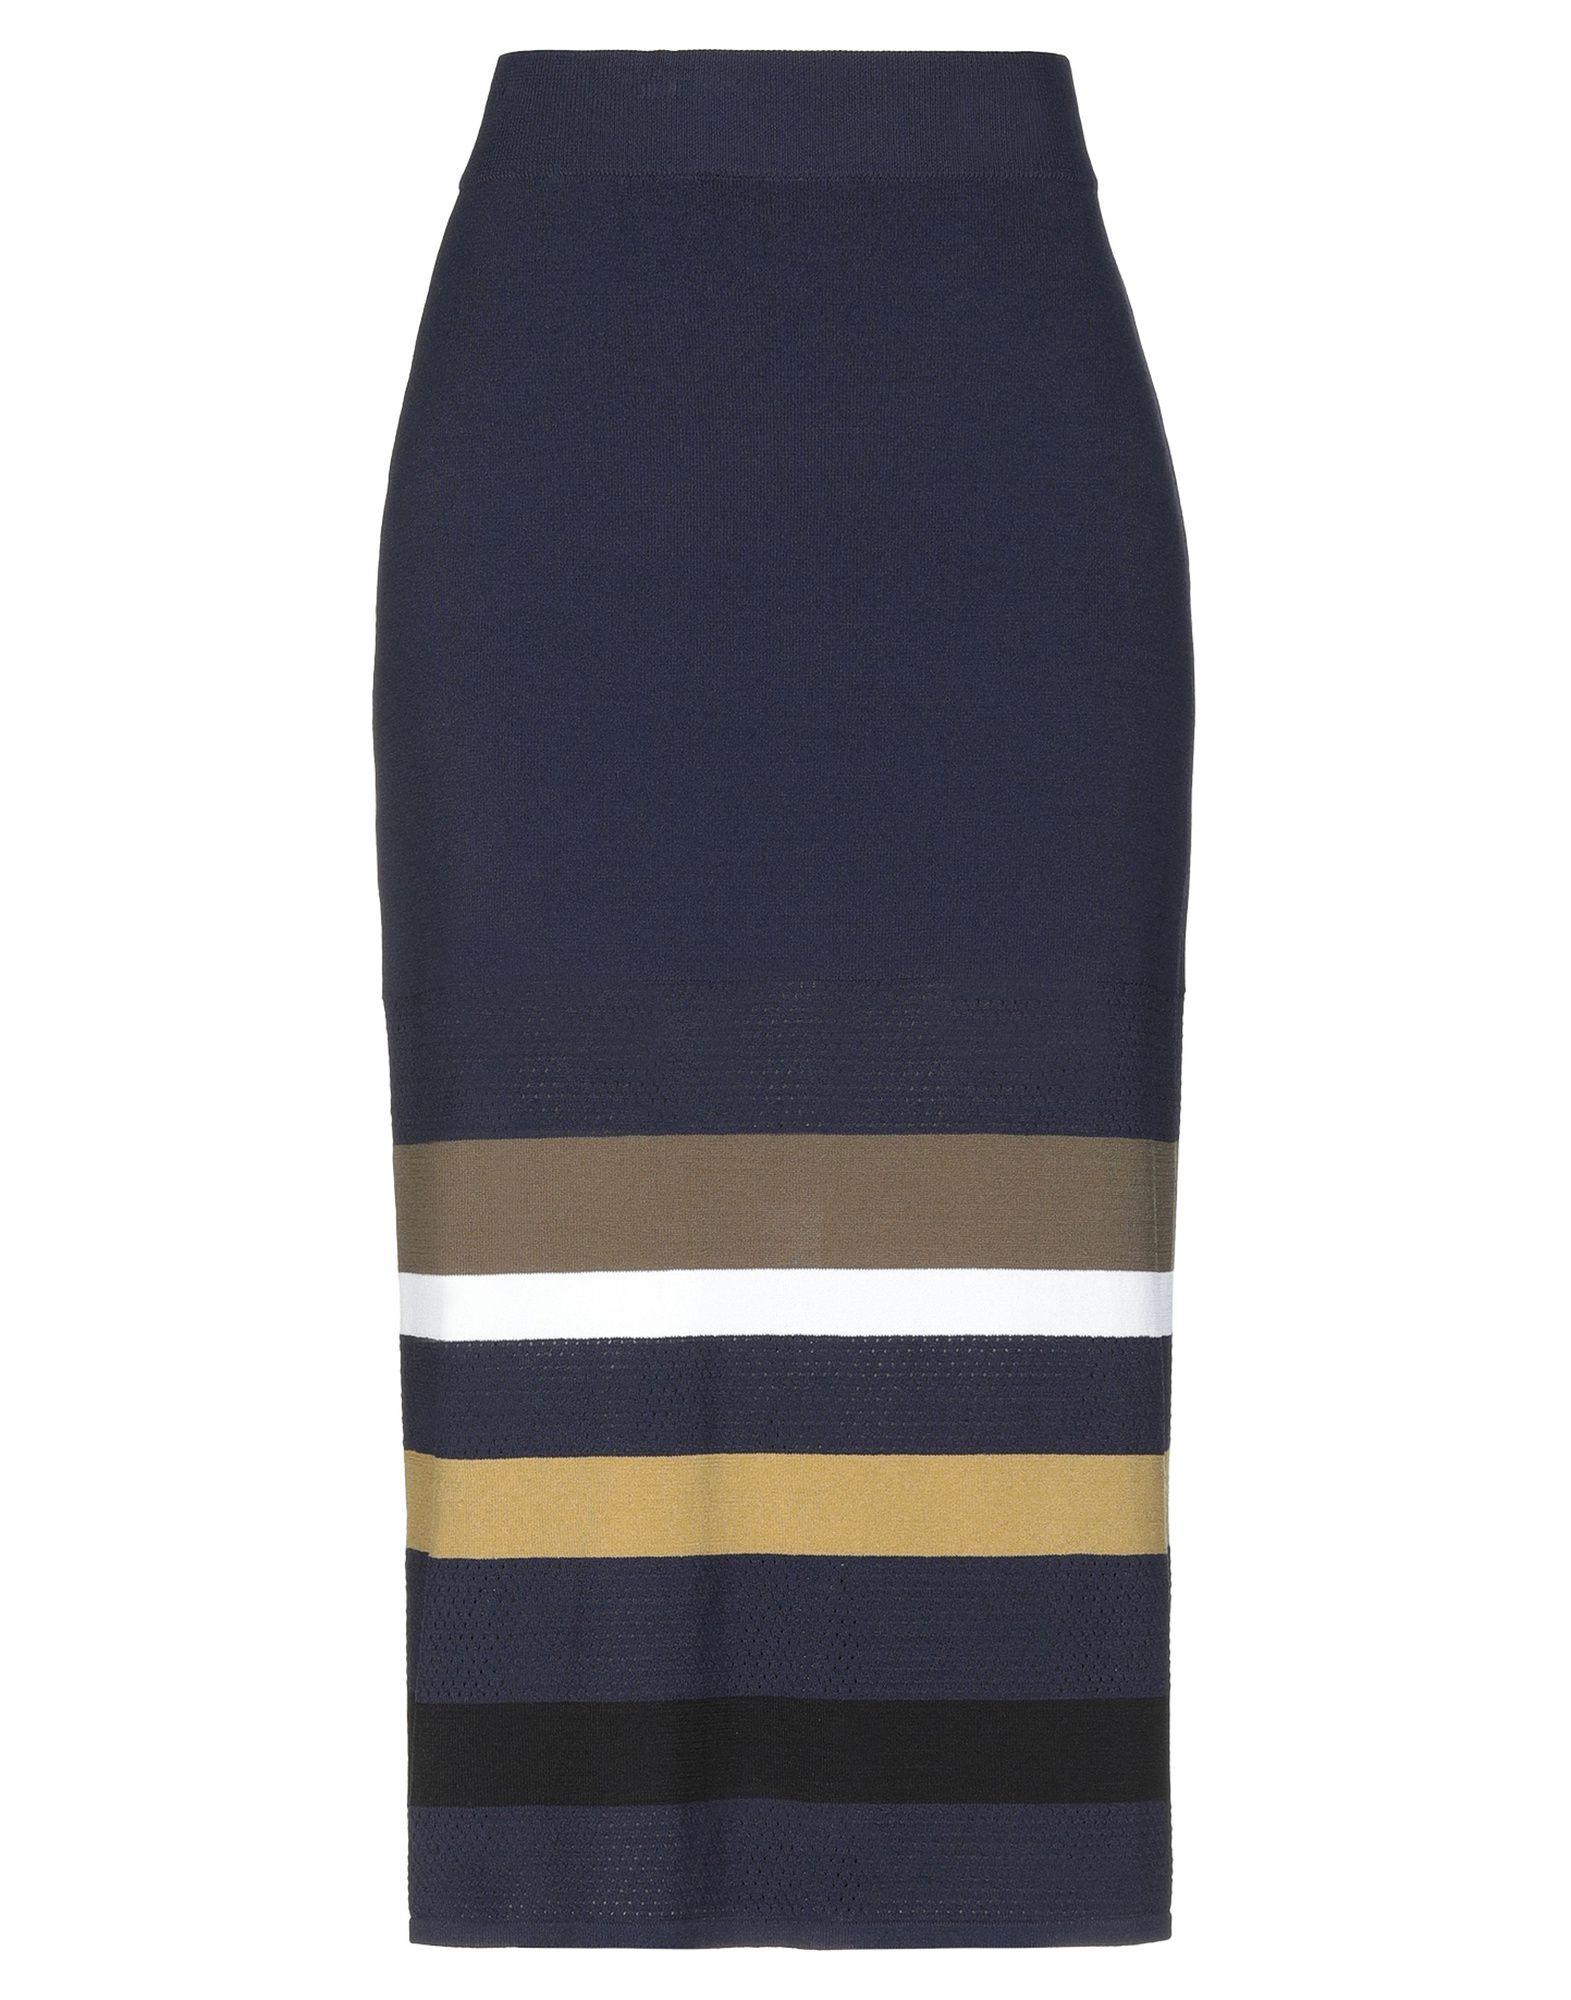 KENZO Юбка длиной 3/4 g na юбка длиной 3 4